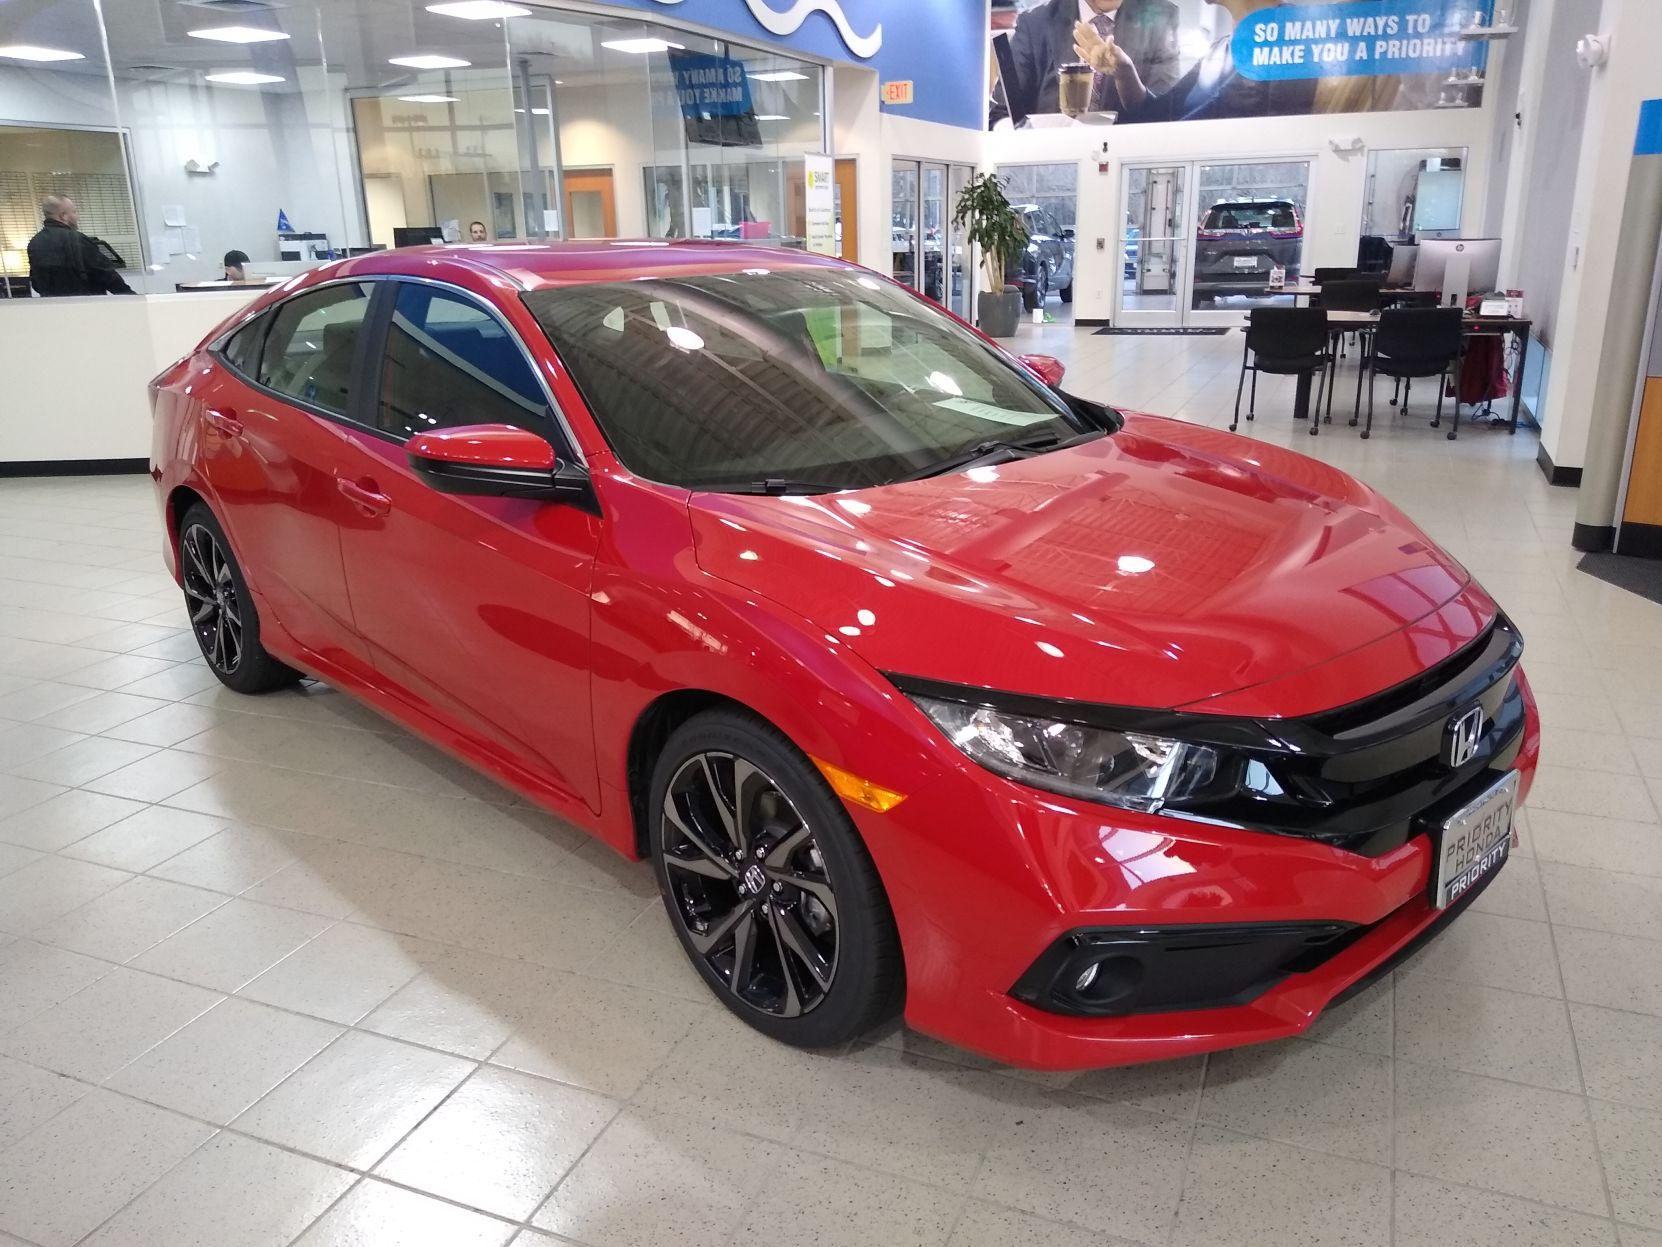 2020 Honda Civic Sport 4 Door Arguably The Best Compact On Sale Automotive Militarynews Com